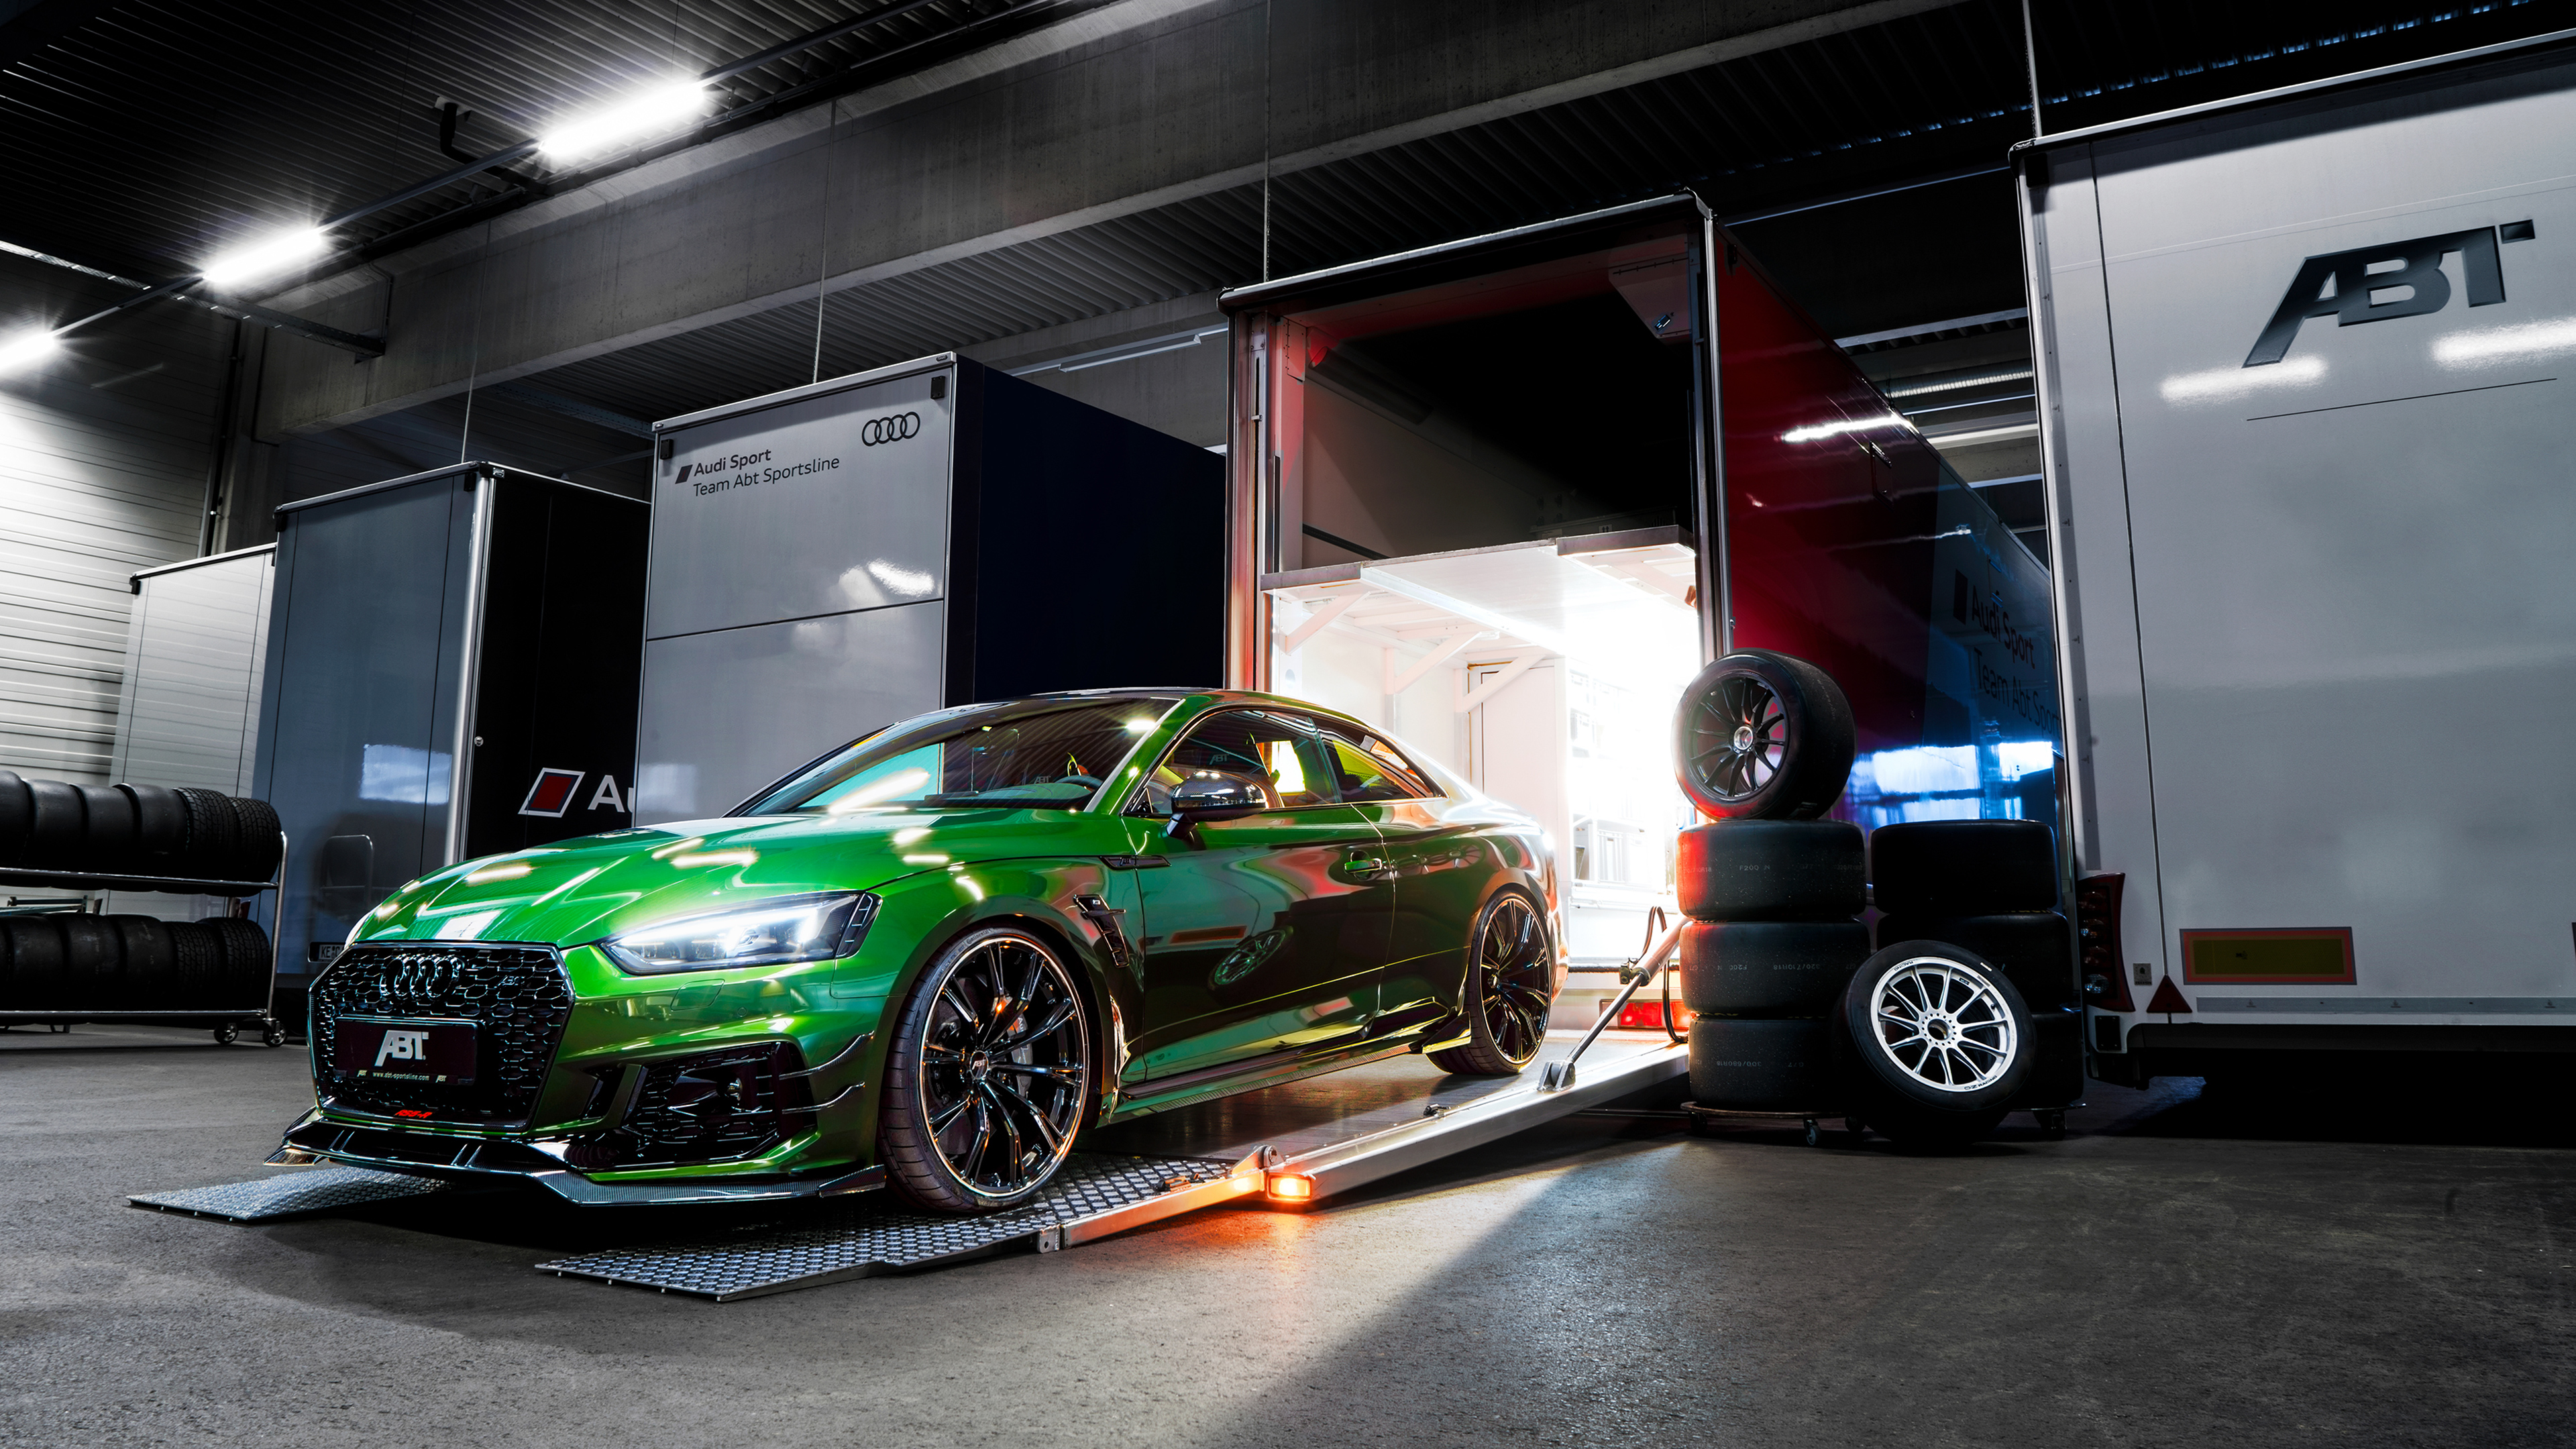 Wallpaper 4k Abt Sportsline Audi Rs 5 R Coupe 4k Abt Audi